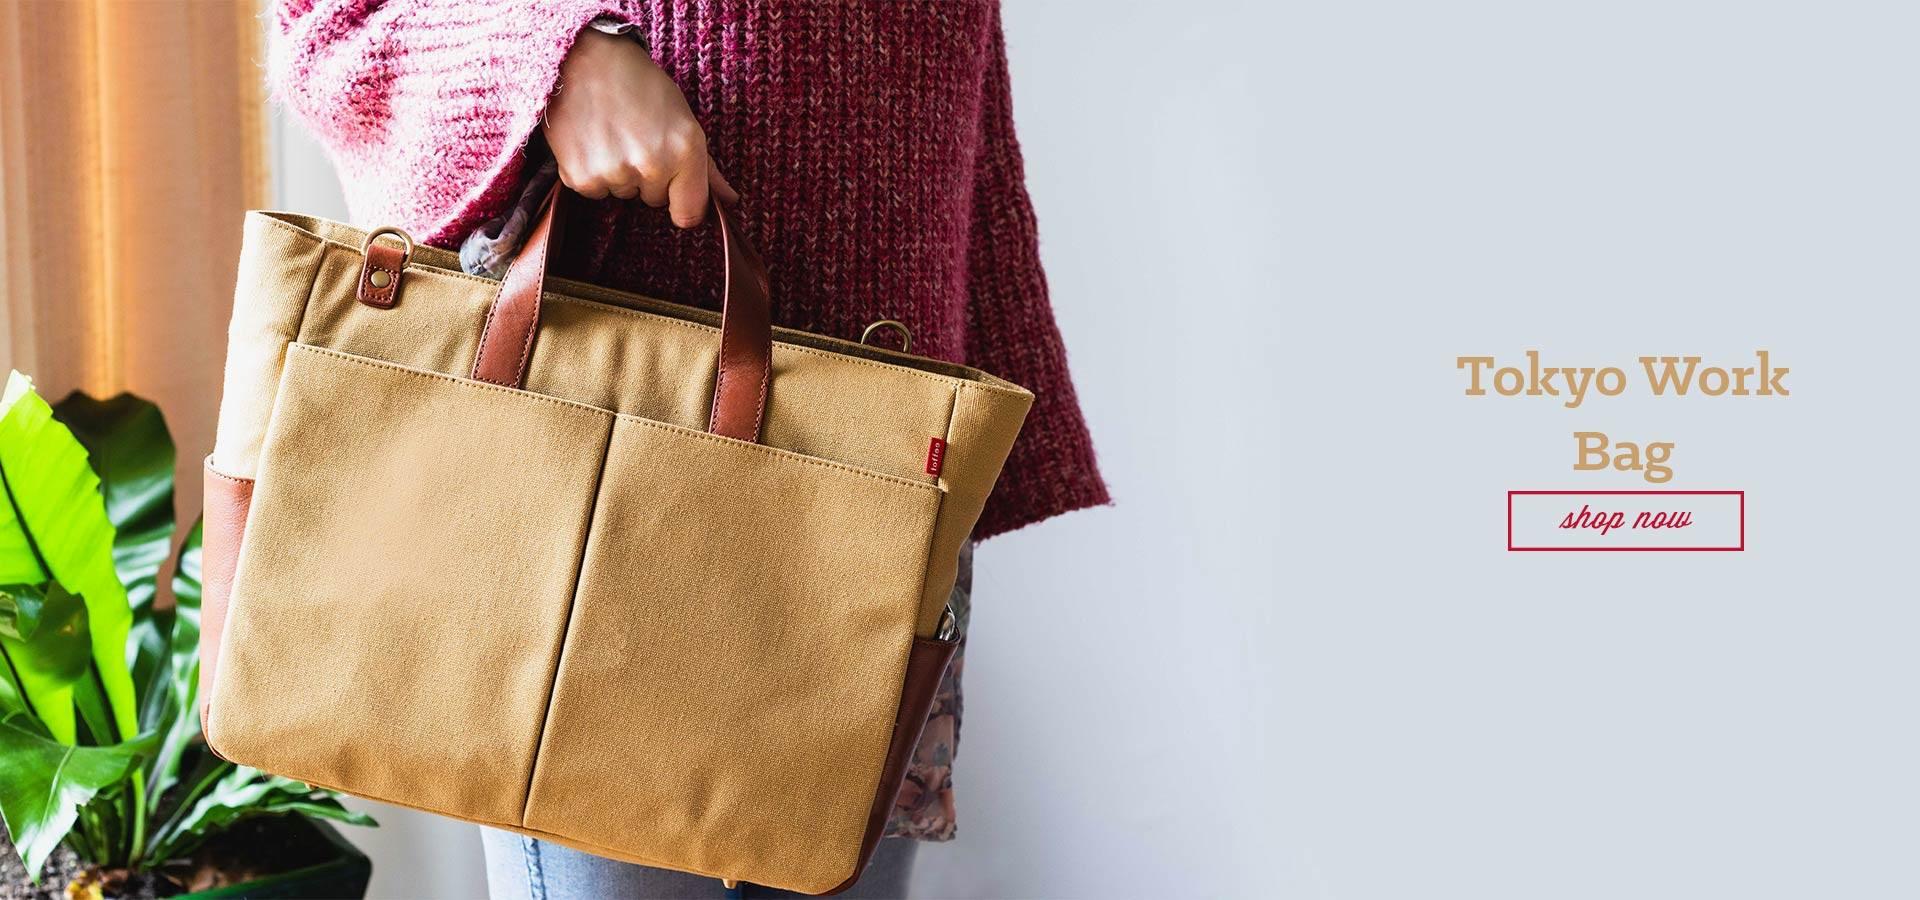 Toffee Cases - Tokyo Work Bag